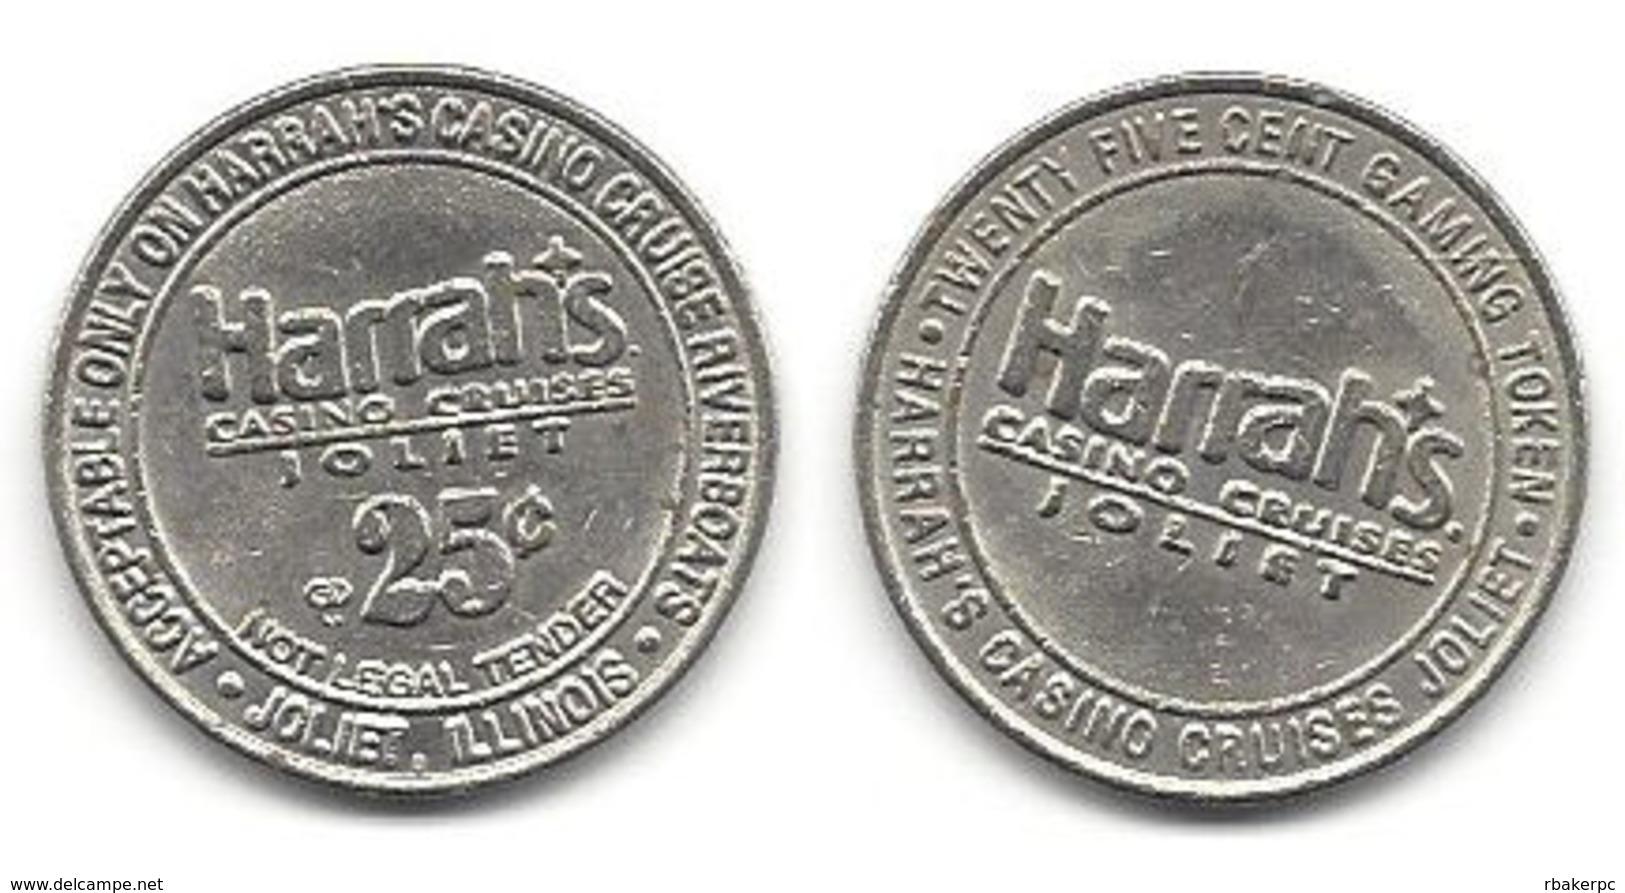 Harrah's Casino Joliet IL 25 Cent Token - Casino